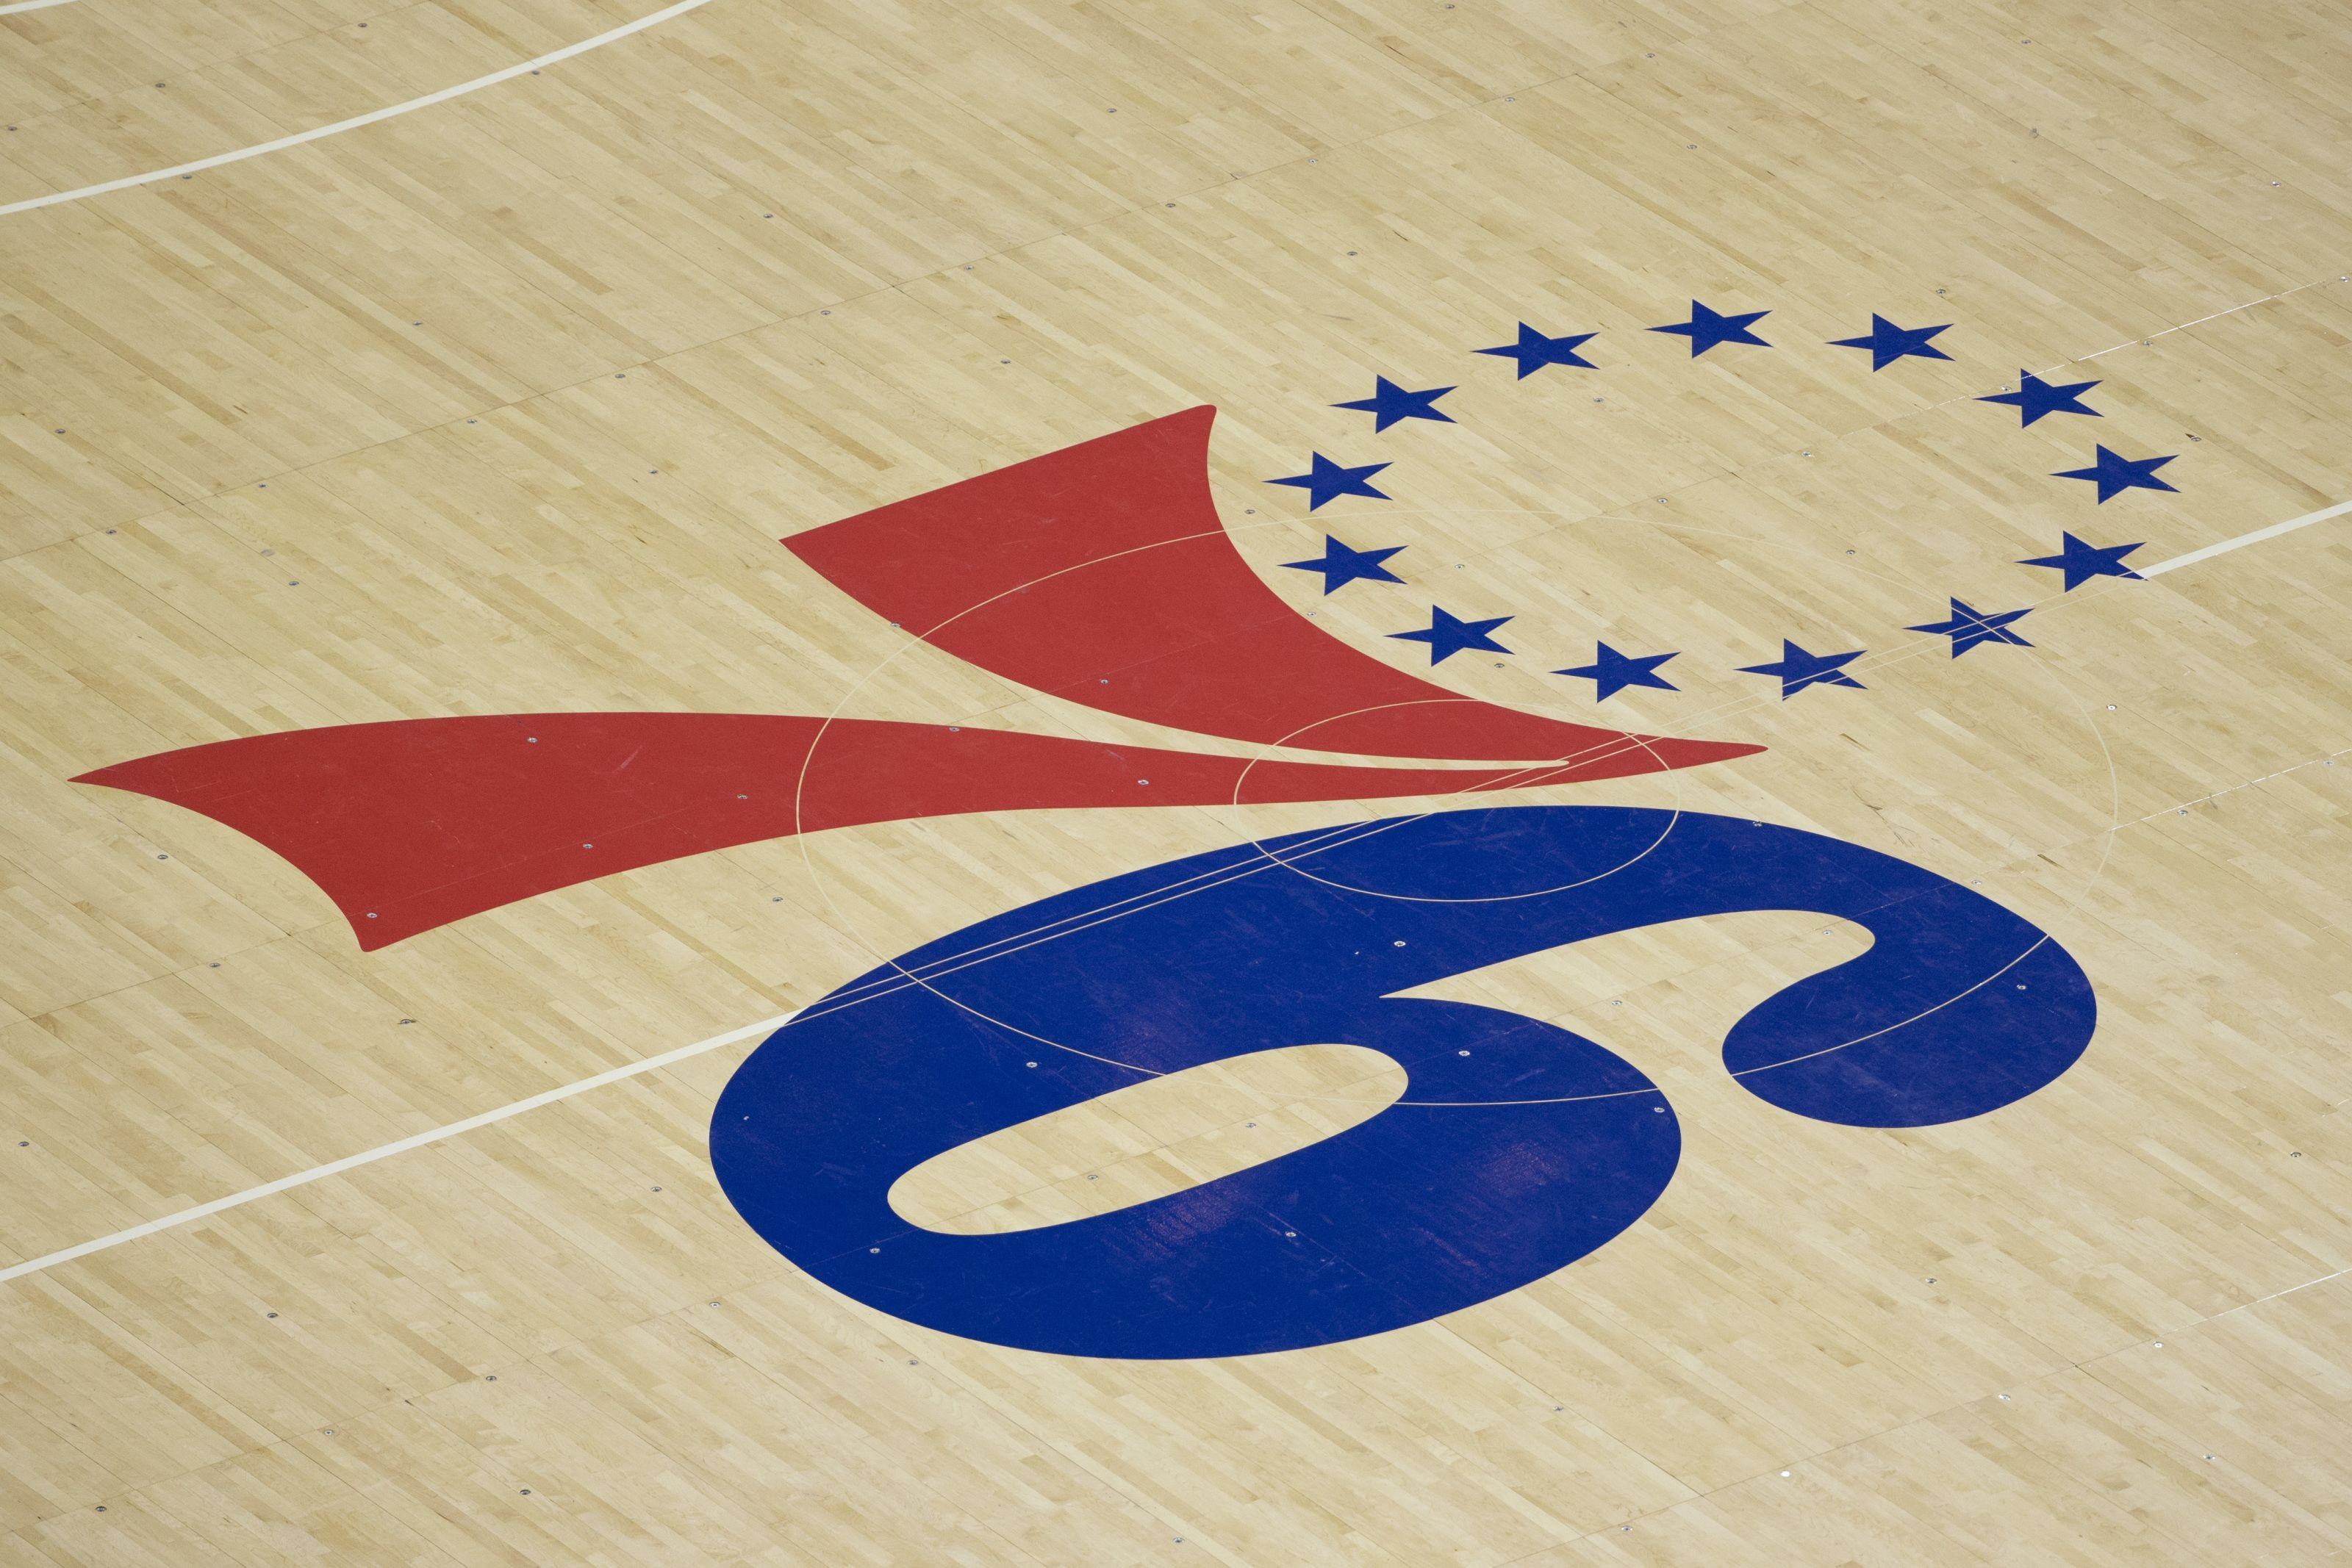 Philadelphia 76ers ranked seventh best team in NBA 2K20